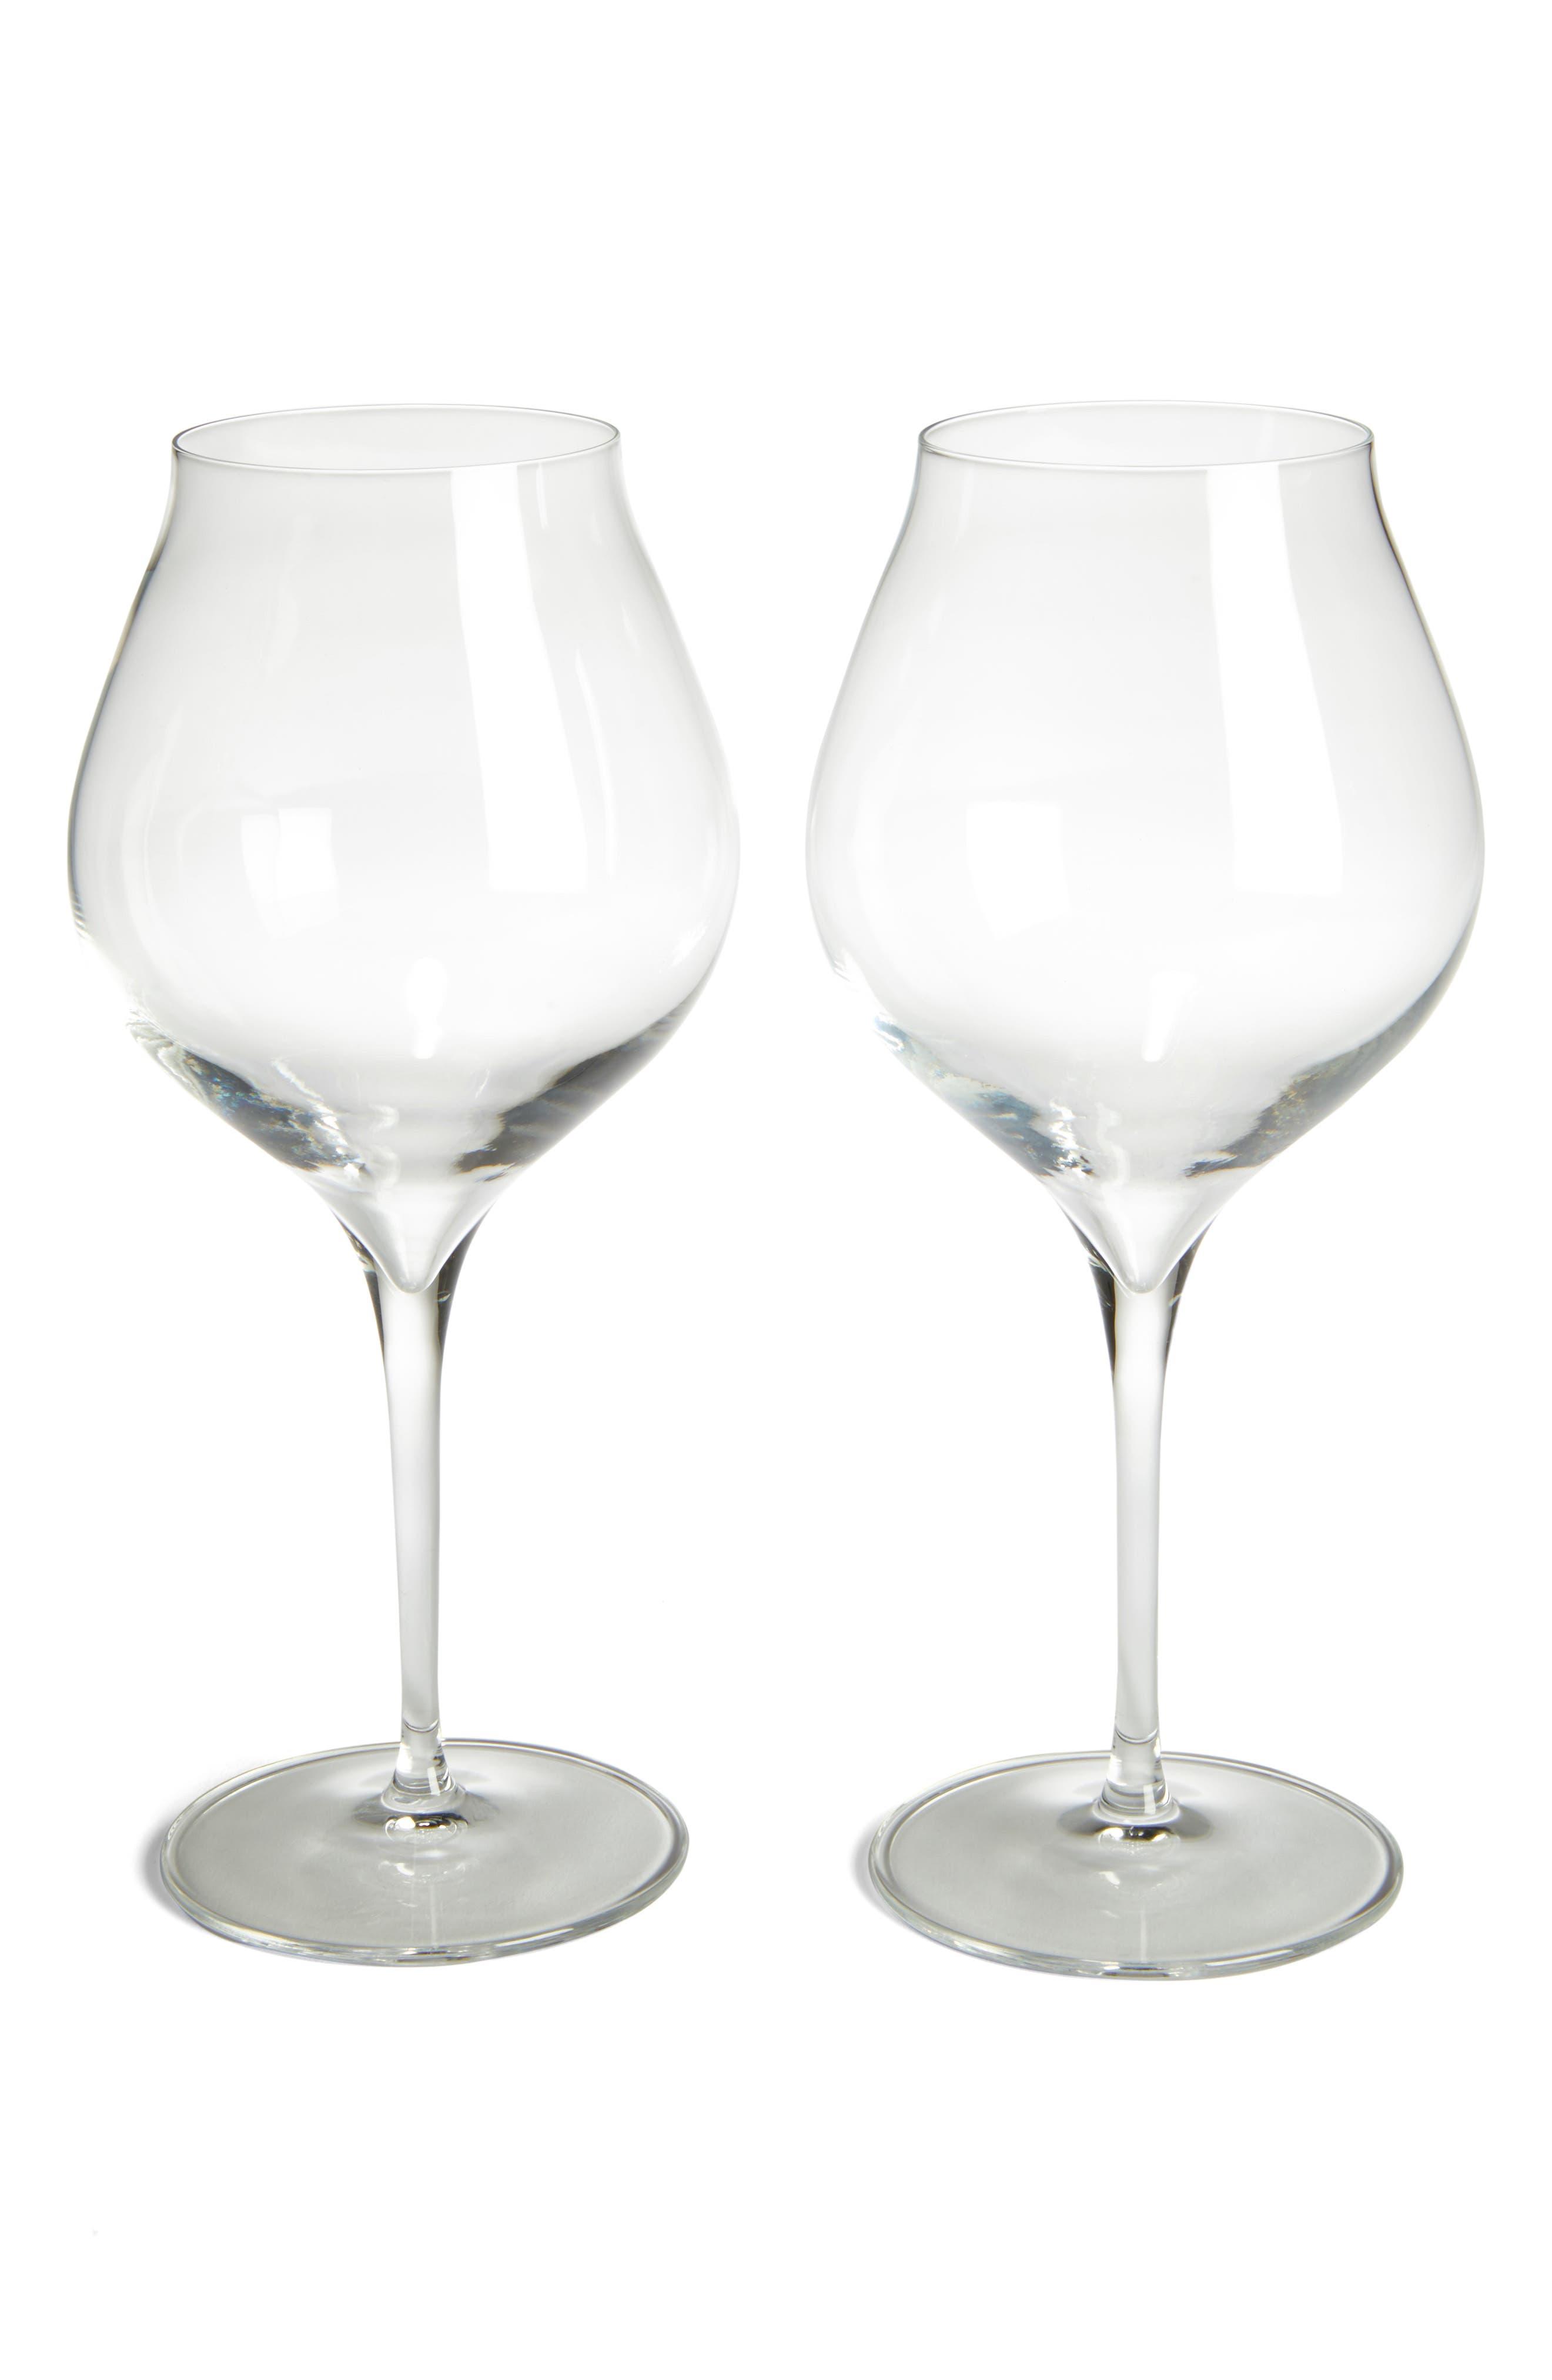 Main Image - Luigi Bormiolo Vinea Corvina/Amarone Set of 2 Red Wine Glasses